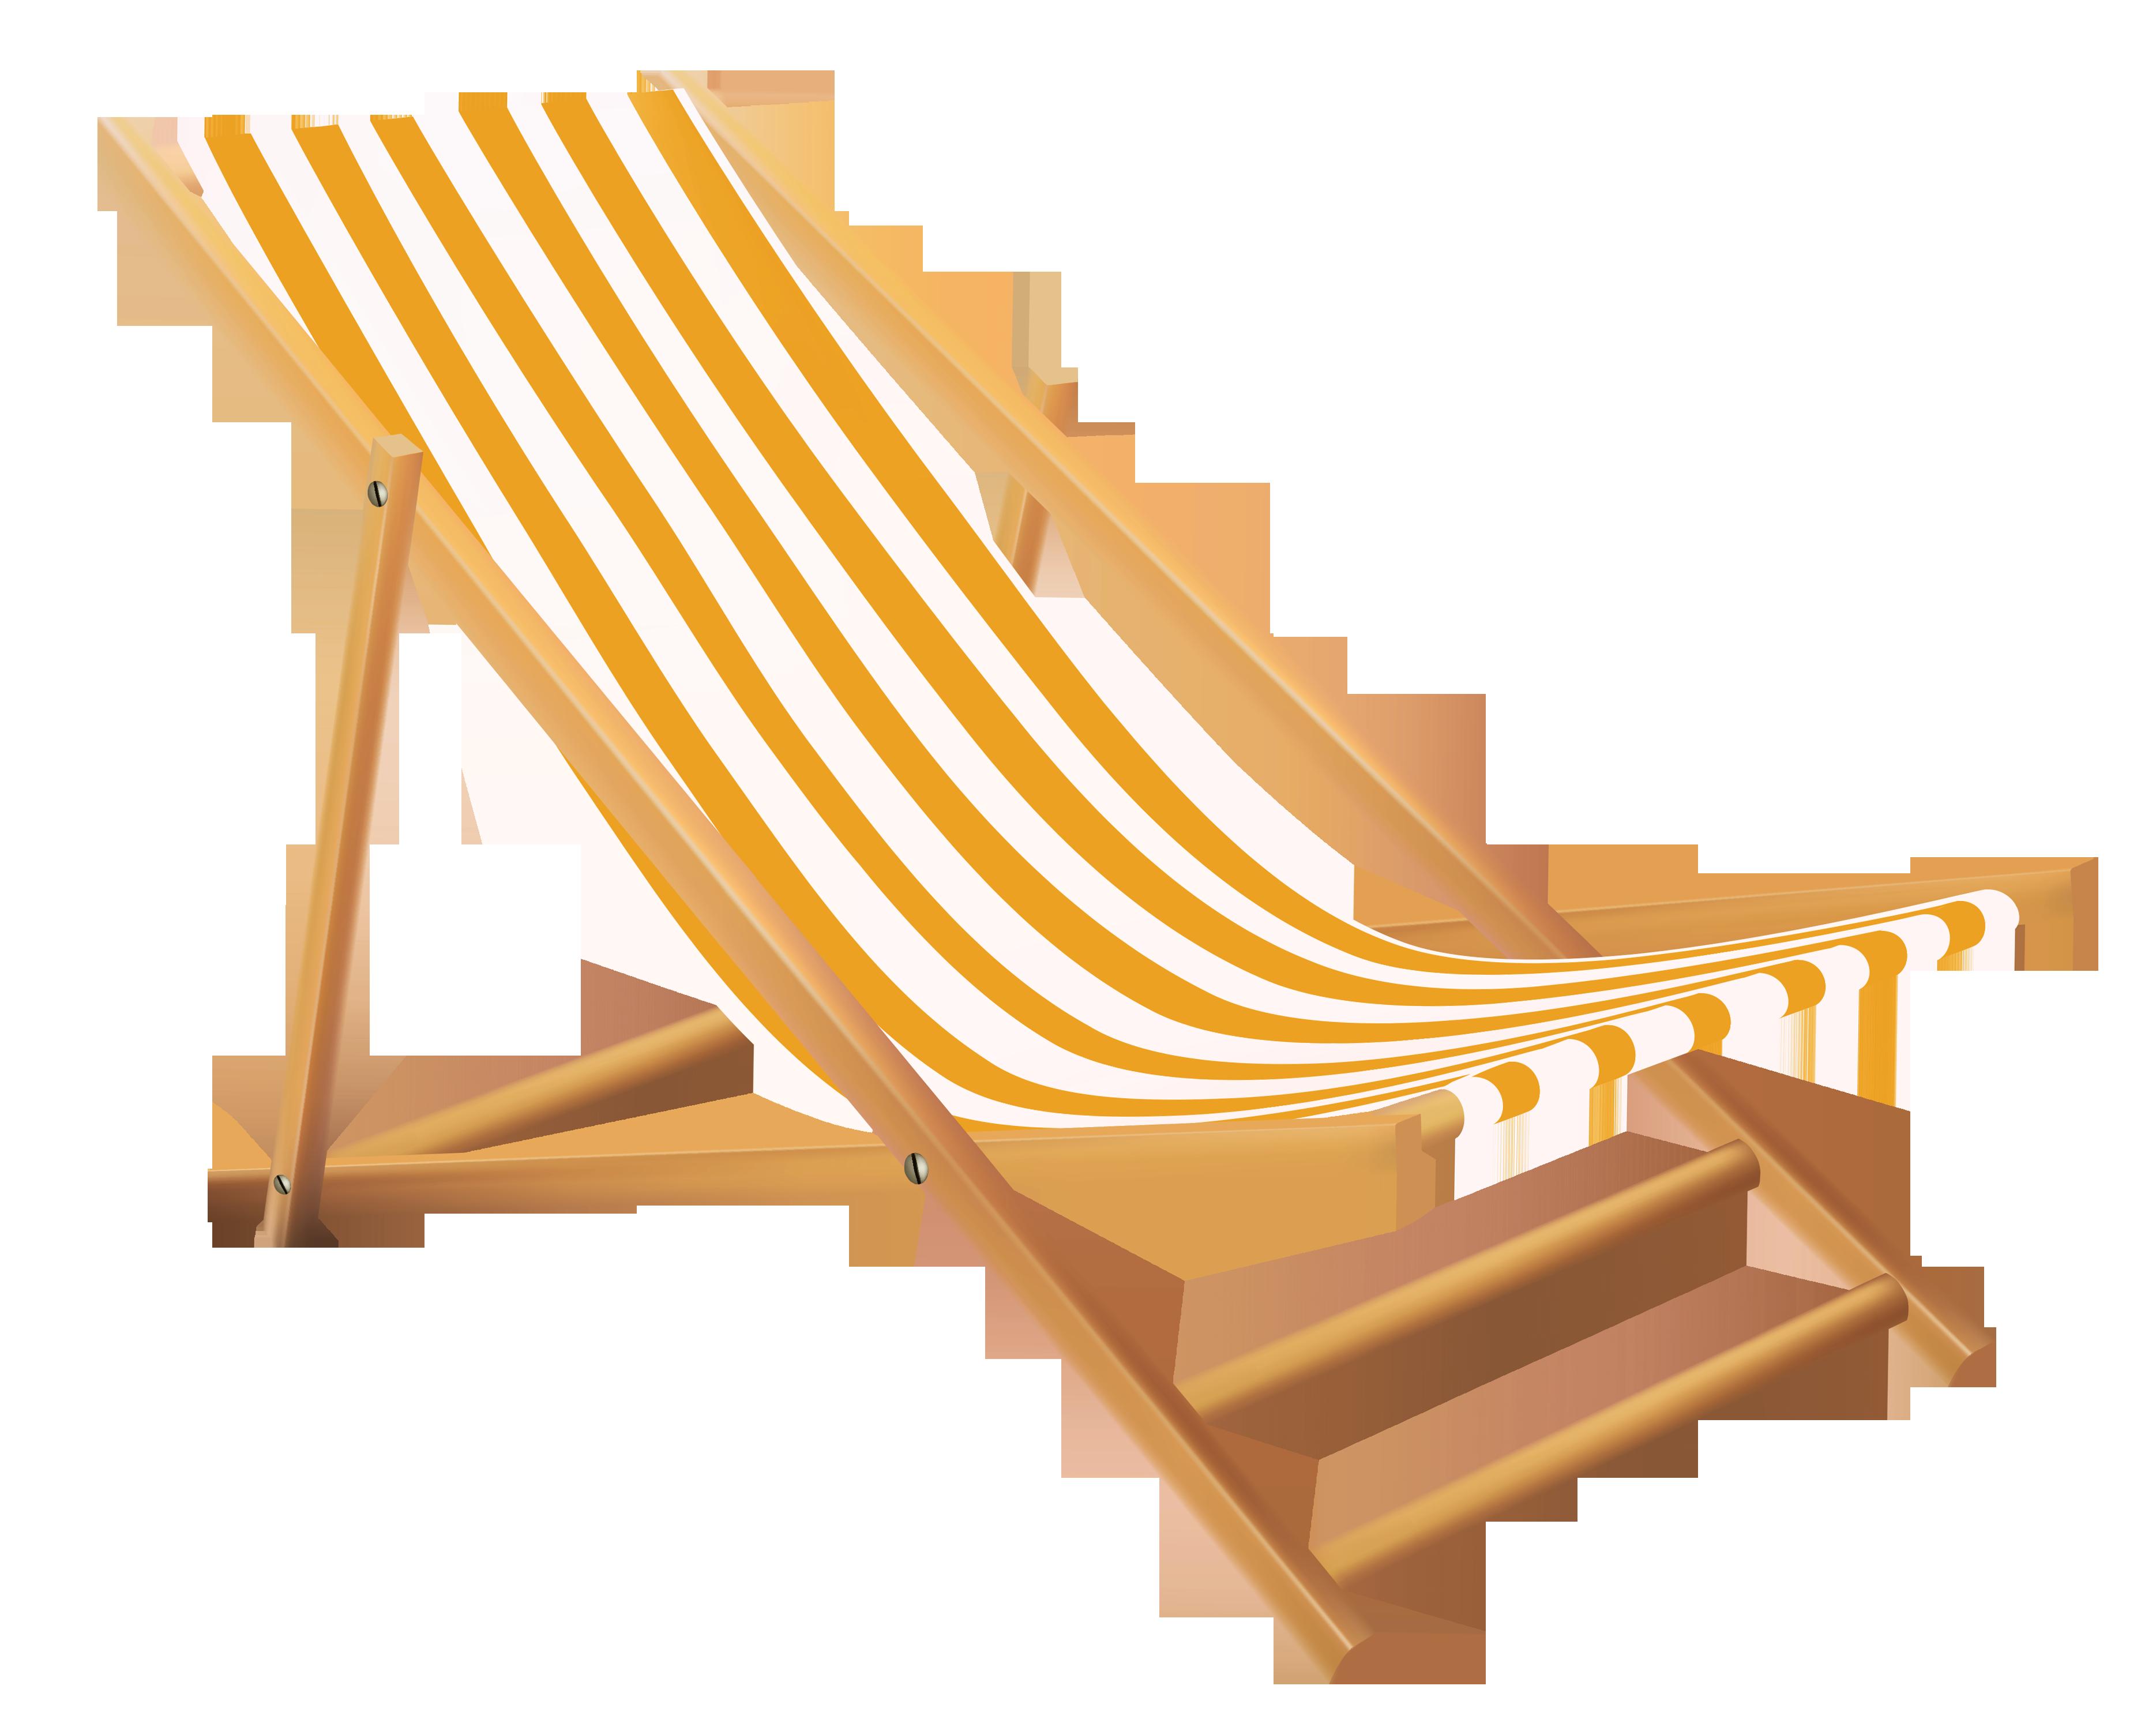 Beach chair clipart clip art freeuse Transparent Beach Lounge Chair Clipart | Locuri de vizitat | Beach ... clip art freeuse